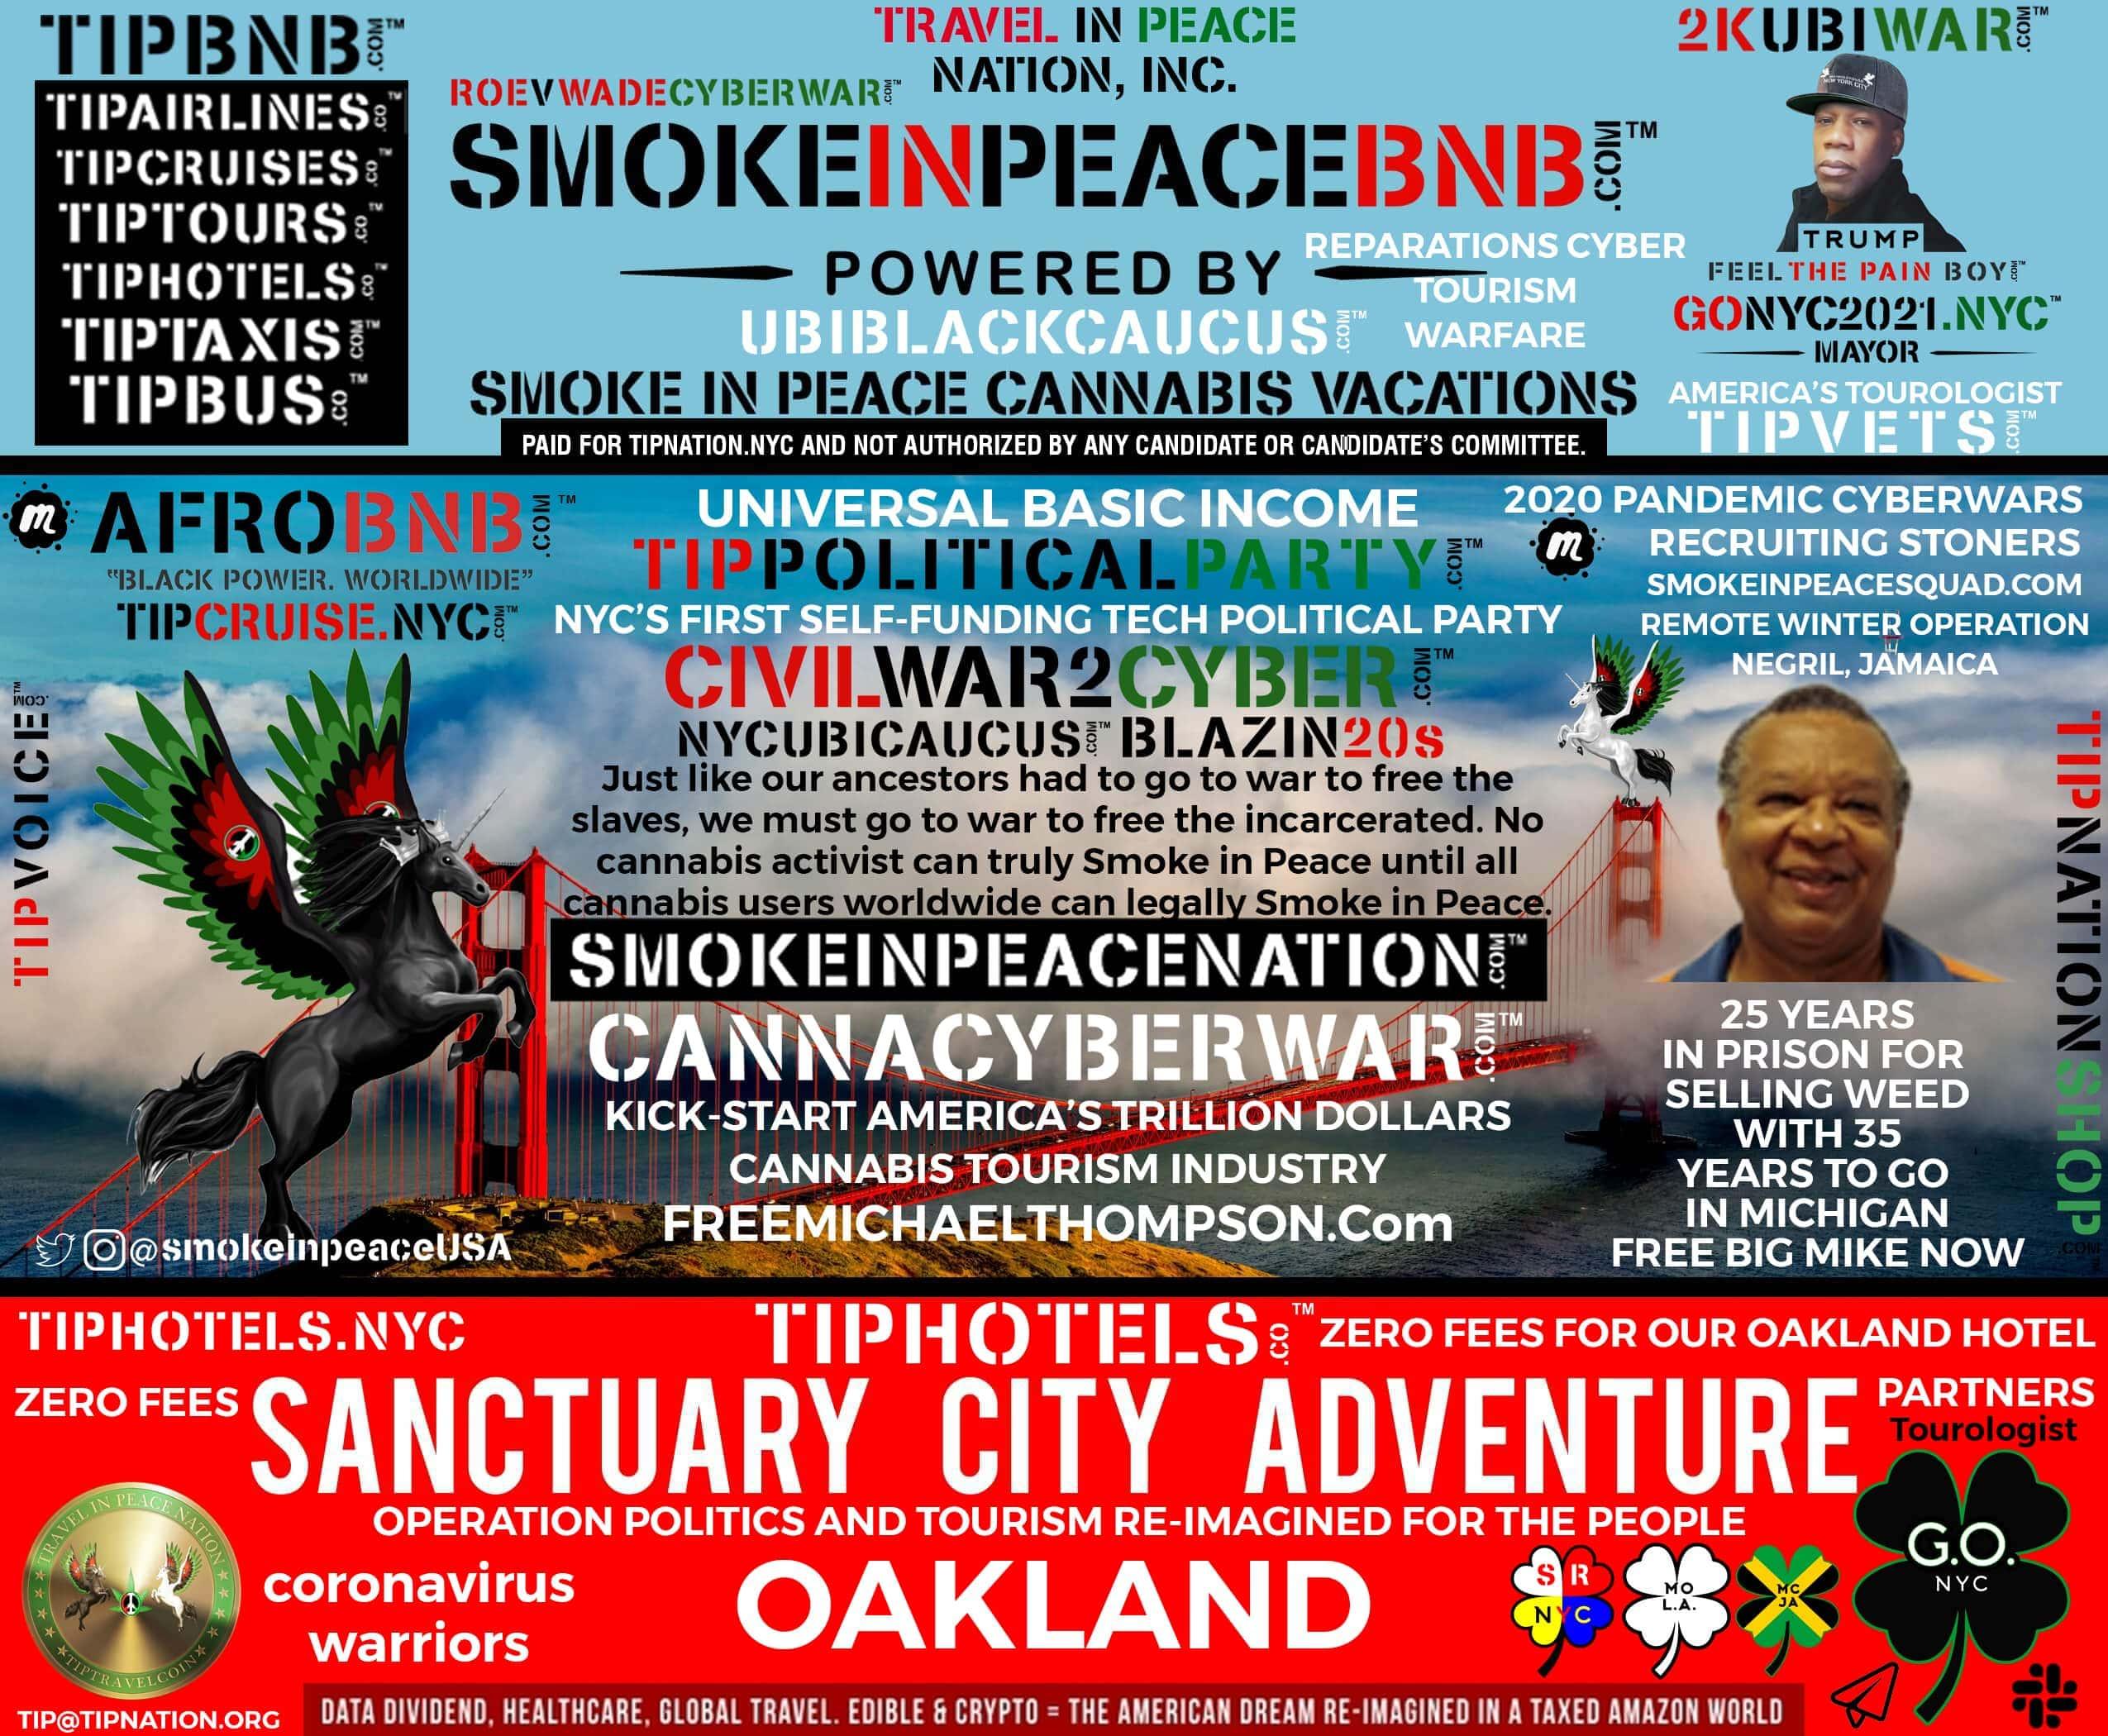 01 MIke oakland-min